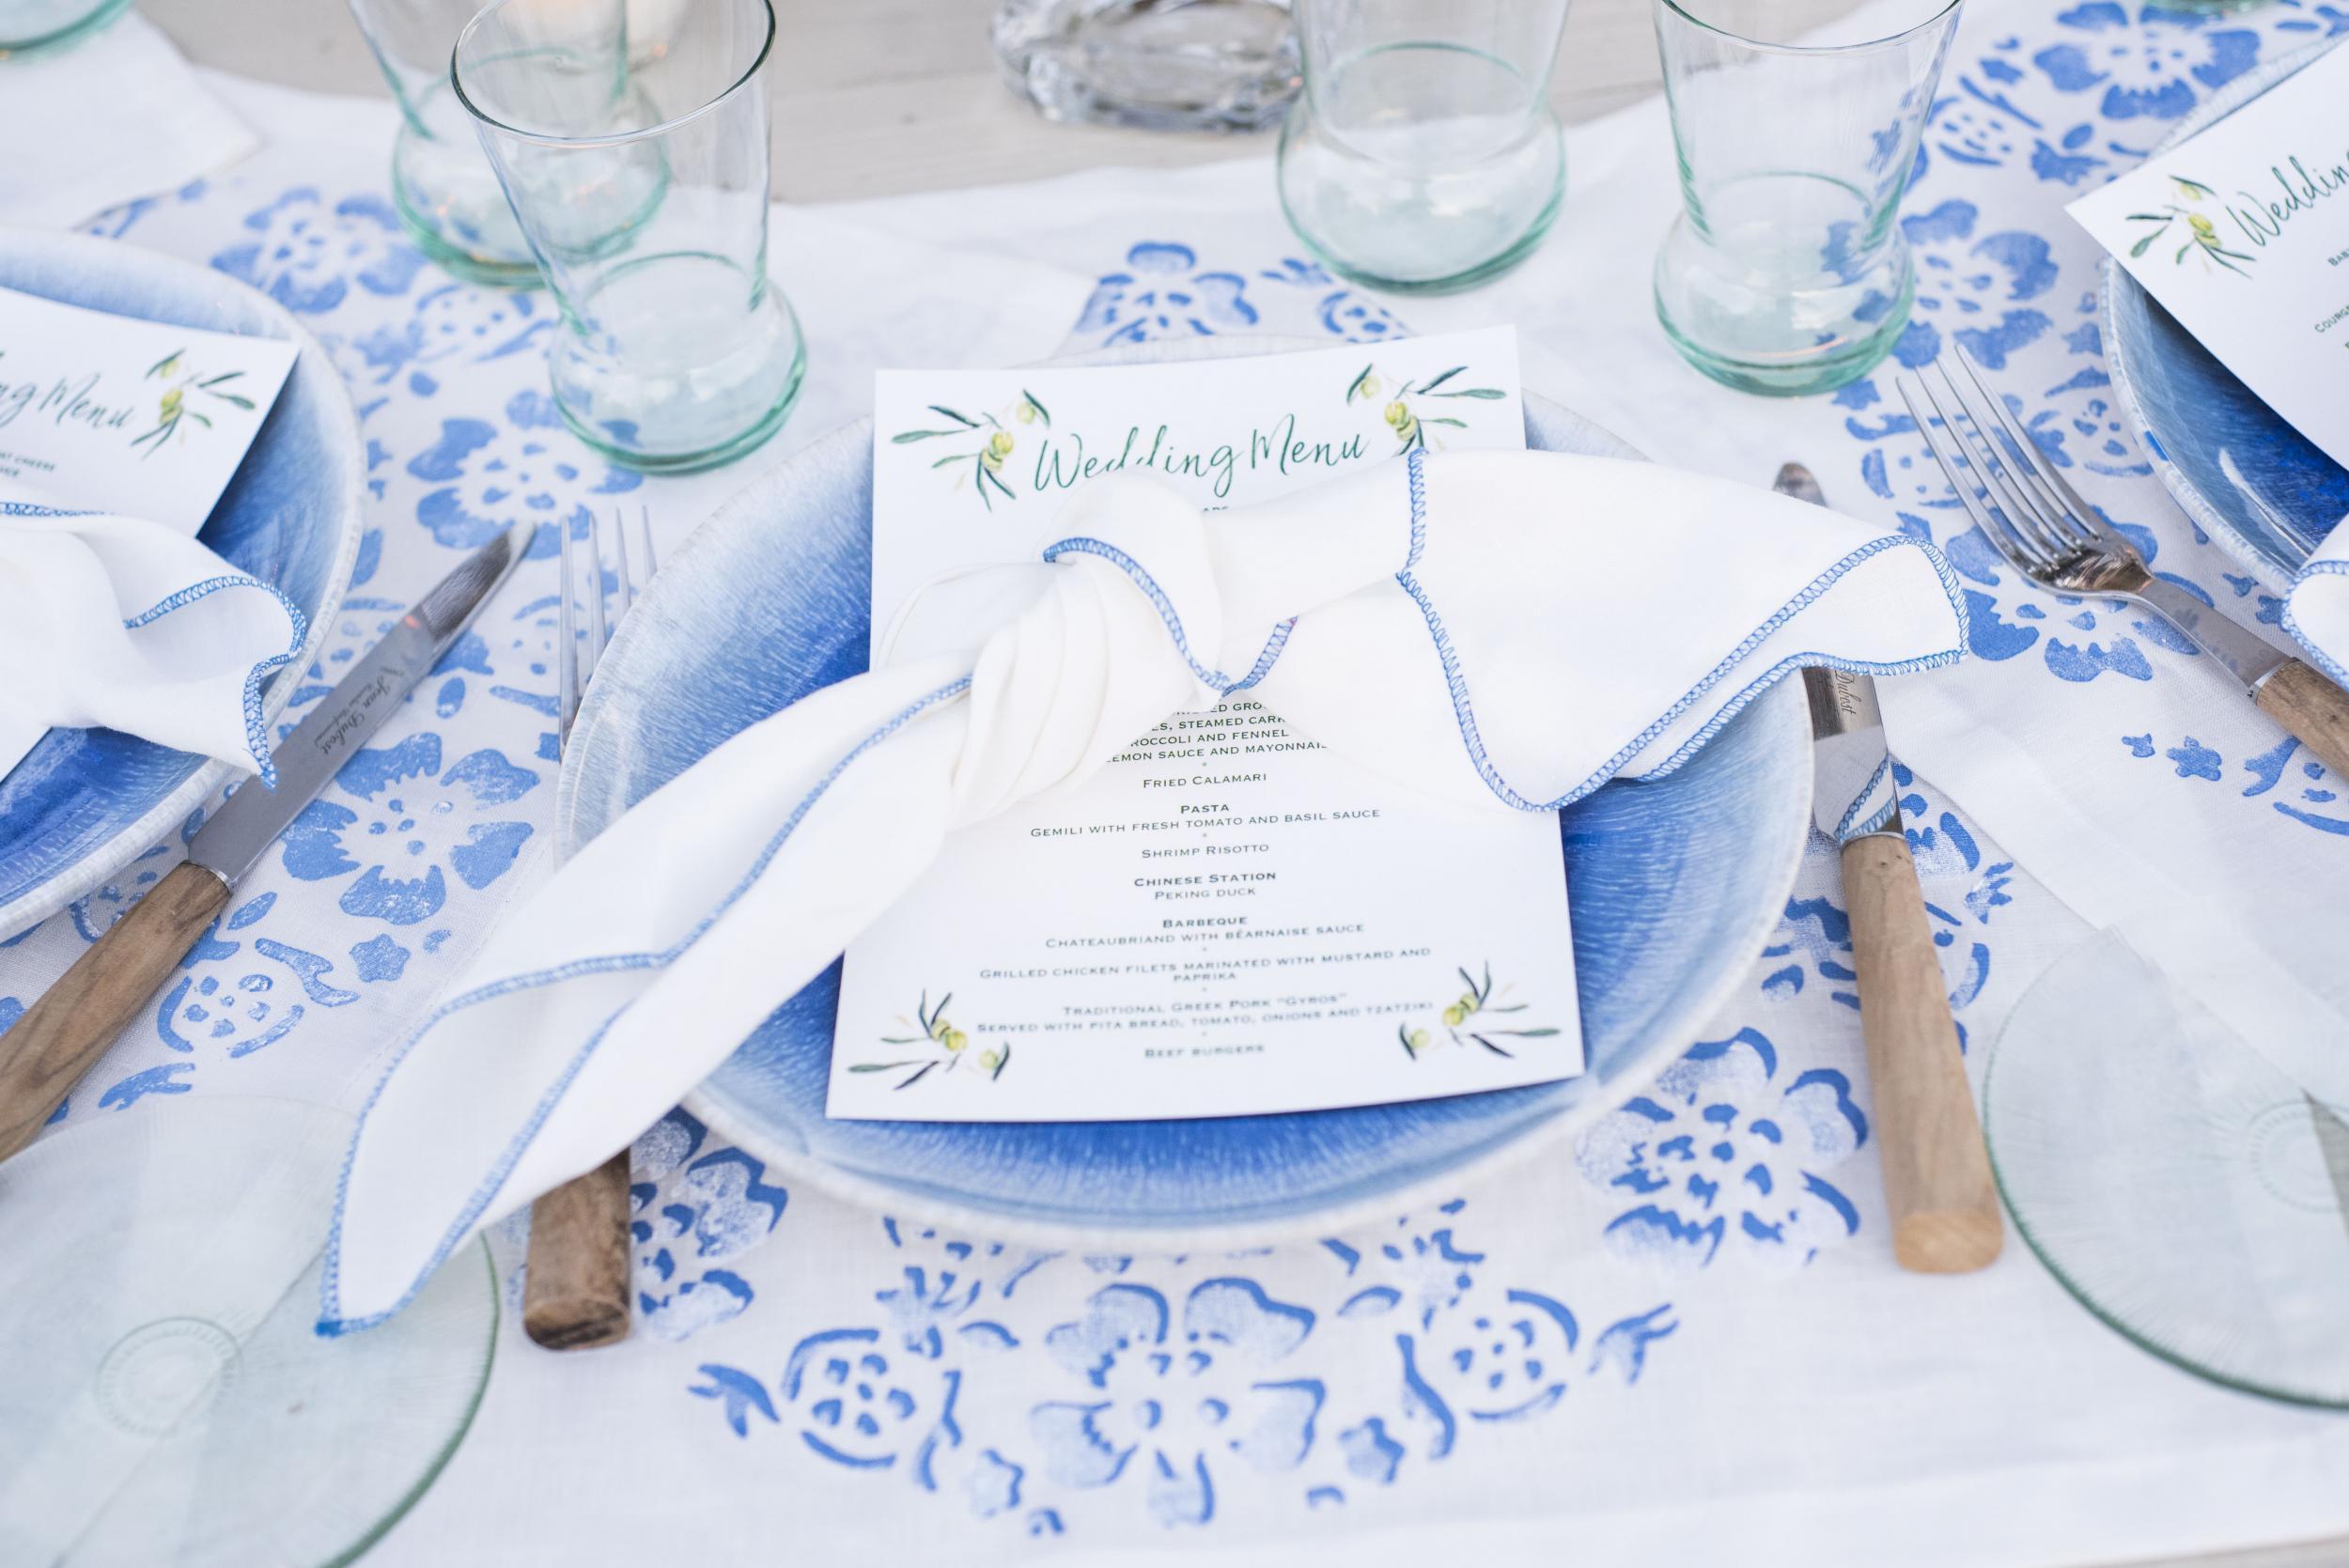 Blue plate set - Image 0